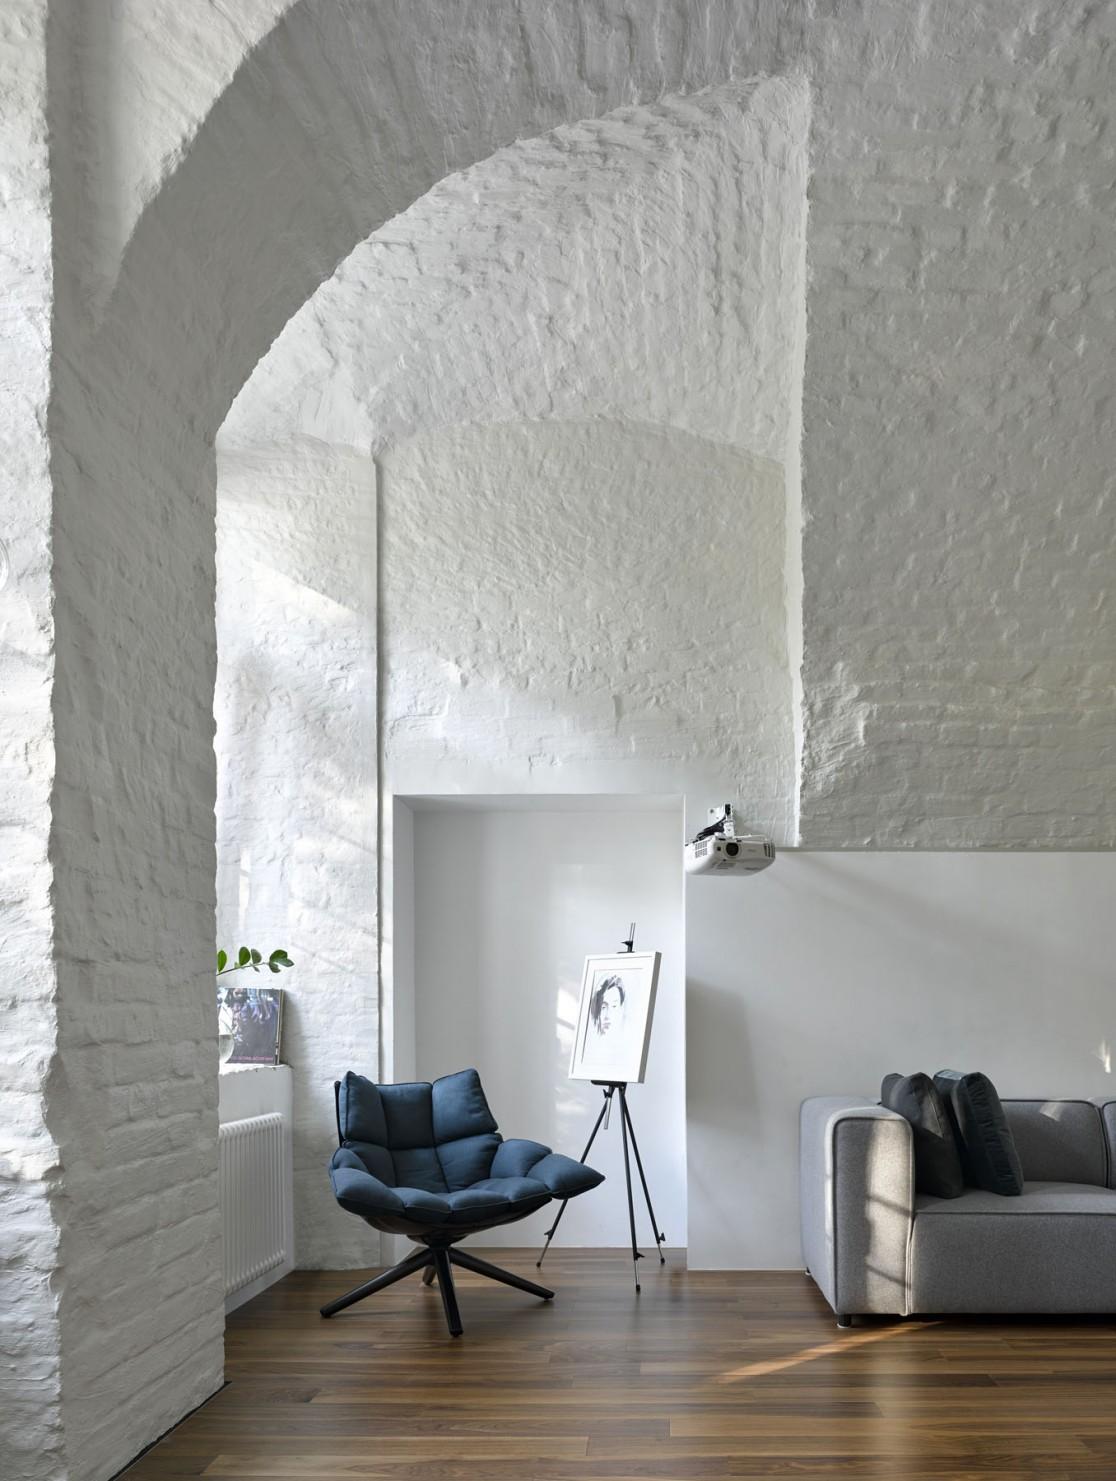 Apartment With Arches Za Bor Architects